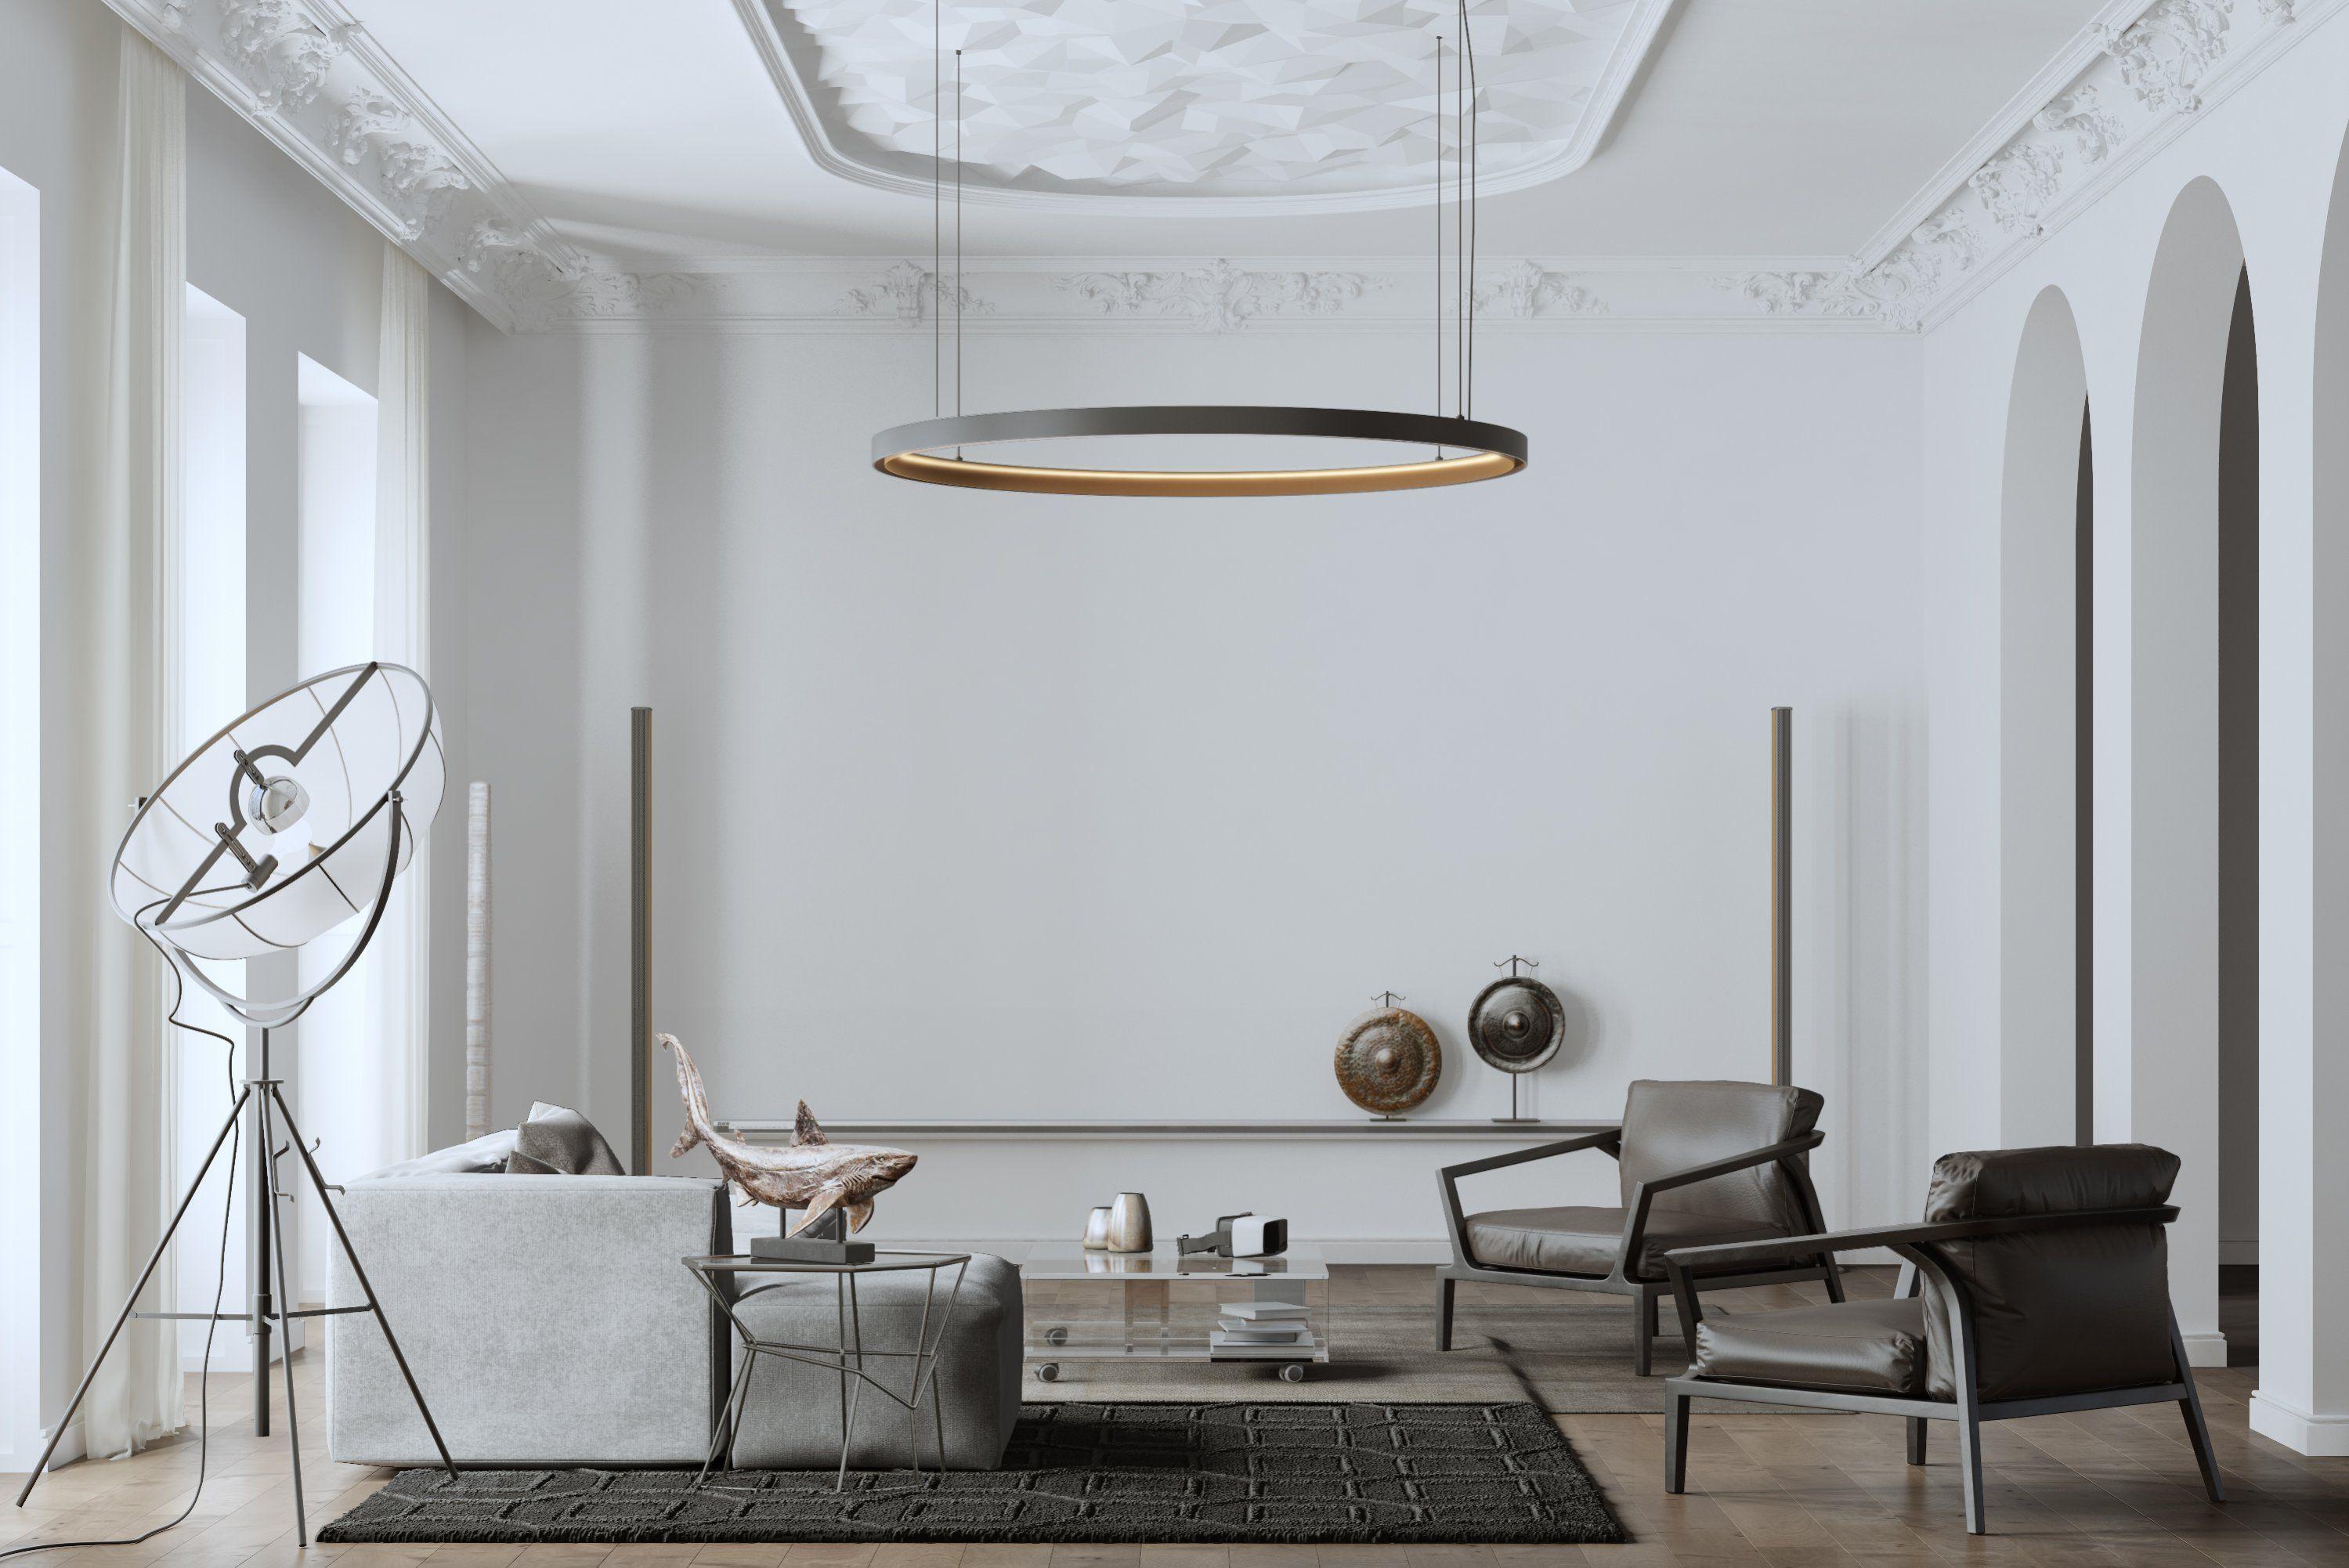 Nice house interior design with round shape lamp on the ceiling livingroom handmade interiors interiordesign interiordesignideas design decor